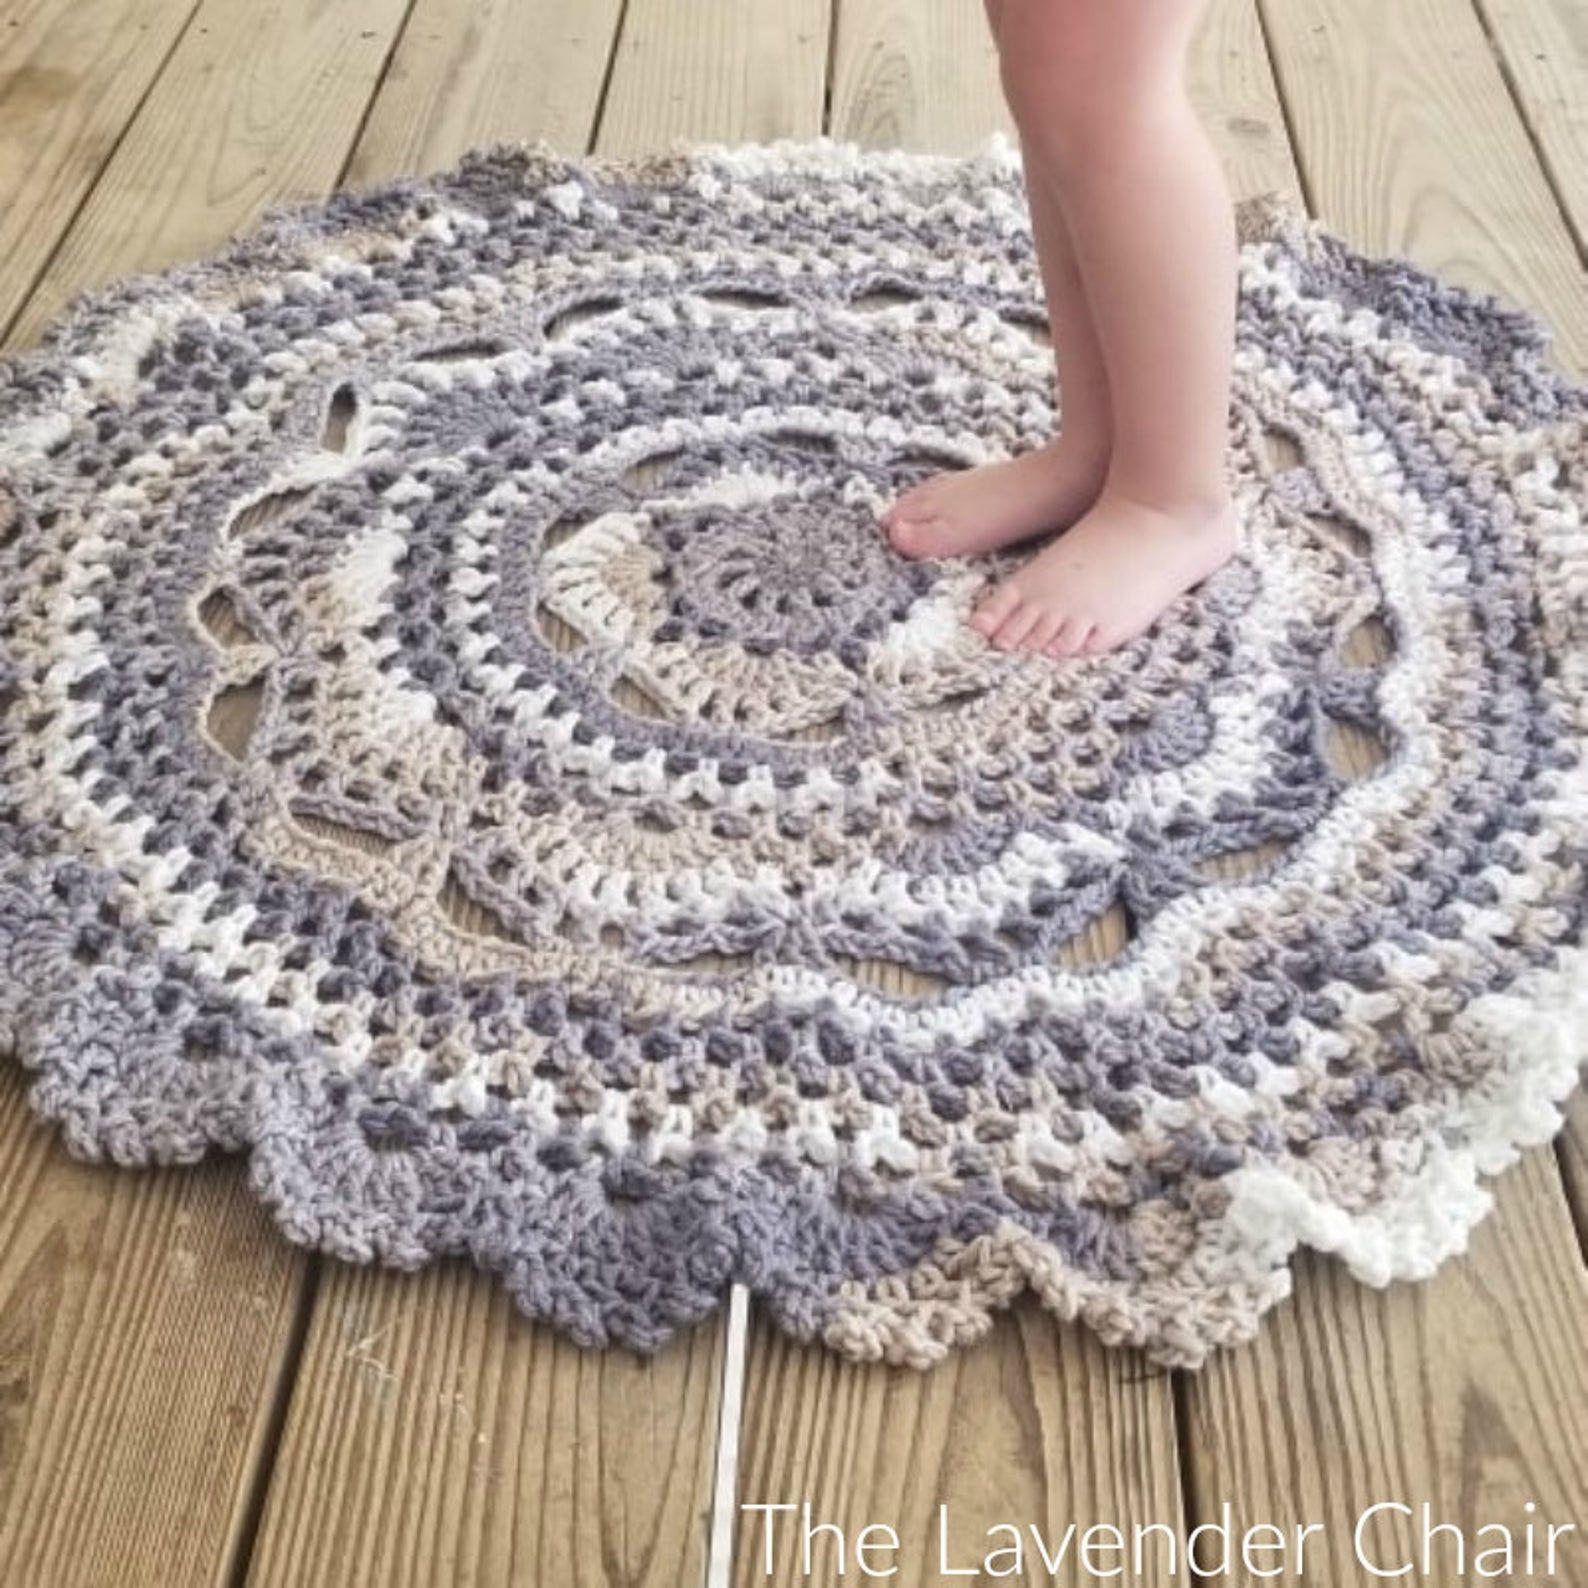 Midnight Star Mandala Rug Crochet Pattern Pdf Download Only Etsy In 2020 Crochet Rug Patterns Crochet Mat Crochet Mandala Pattern